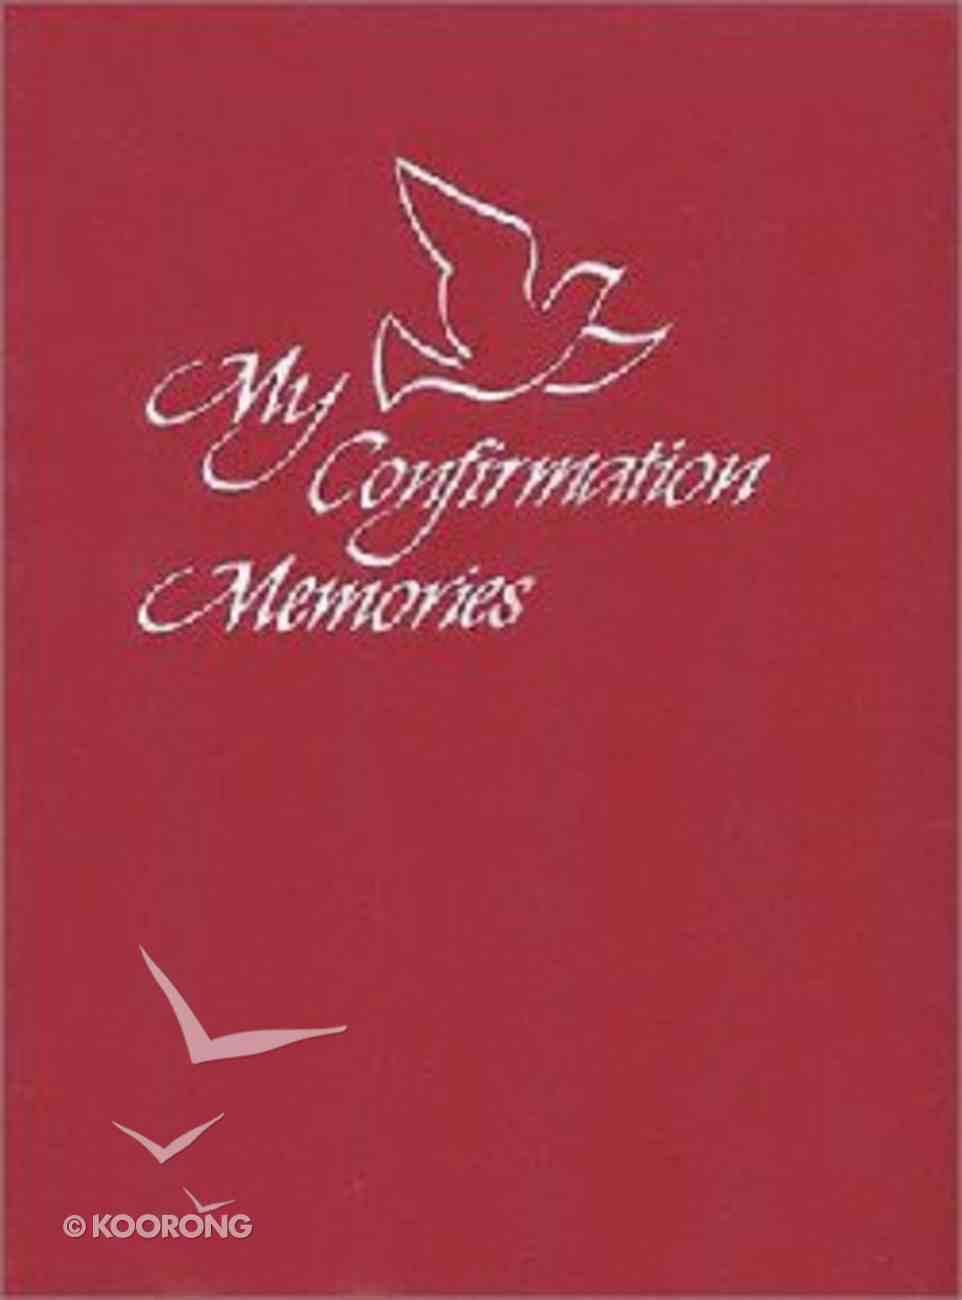 My Confirmation Memories Hardback